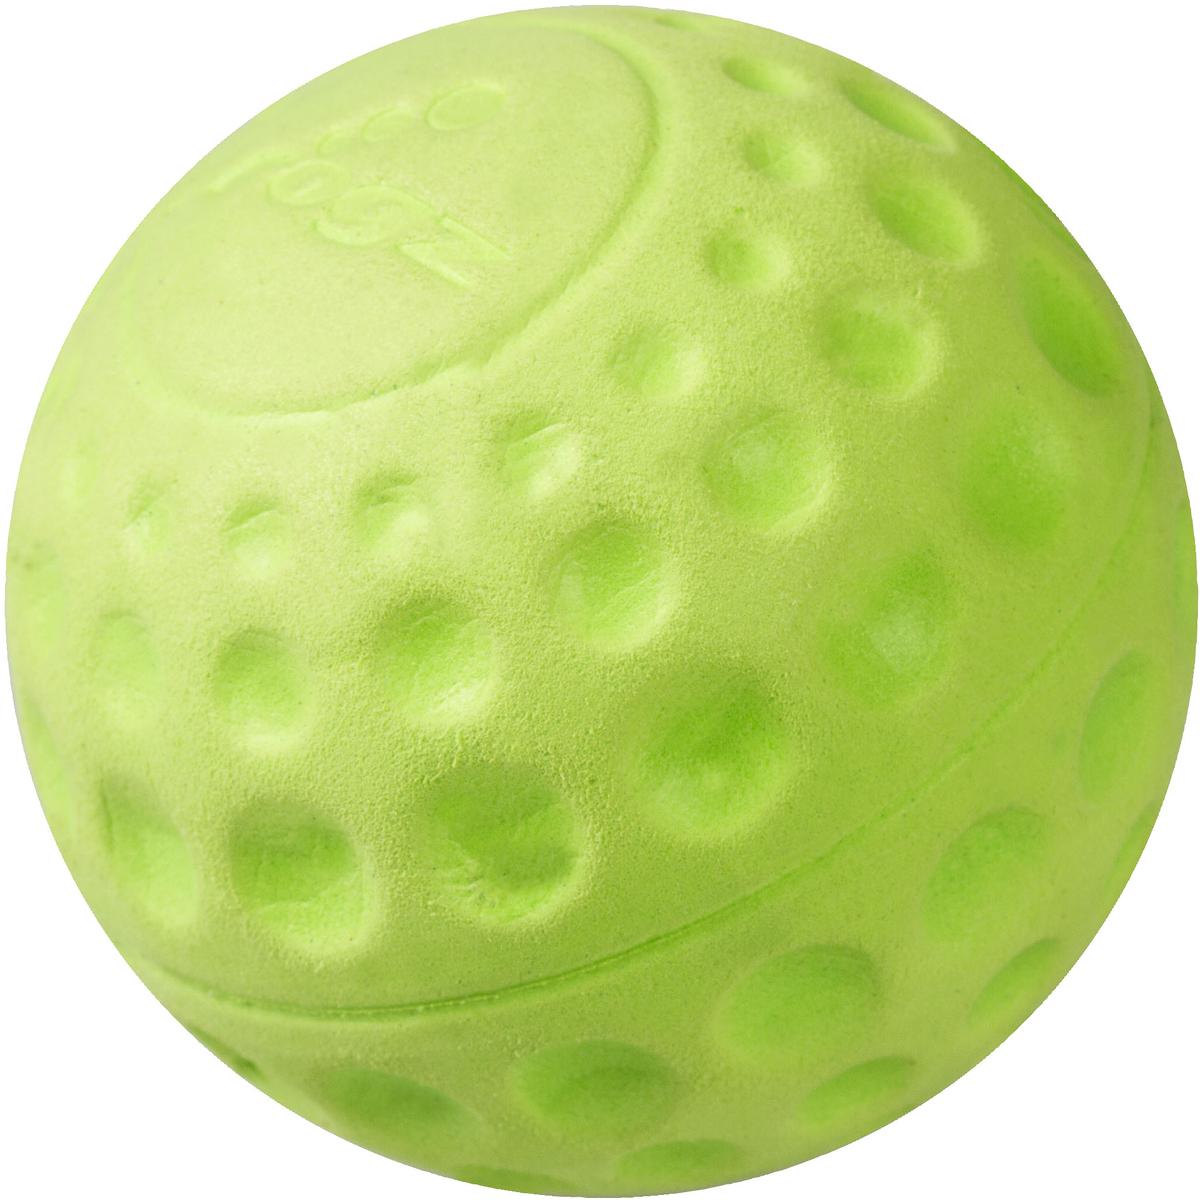 Игрушка для собак Rogz  Asteroidz , цвет: лайм, диаметр 6,4 см - Игрушки